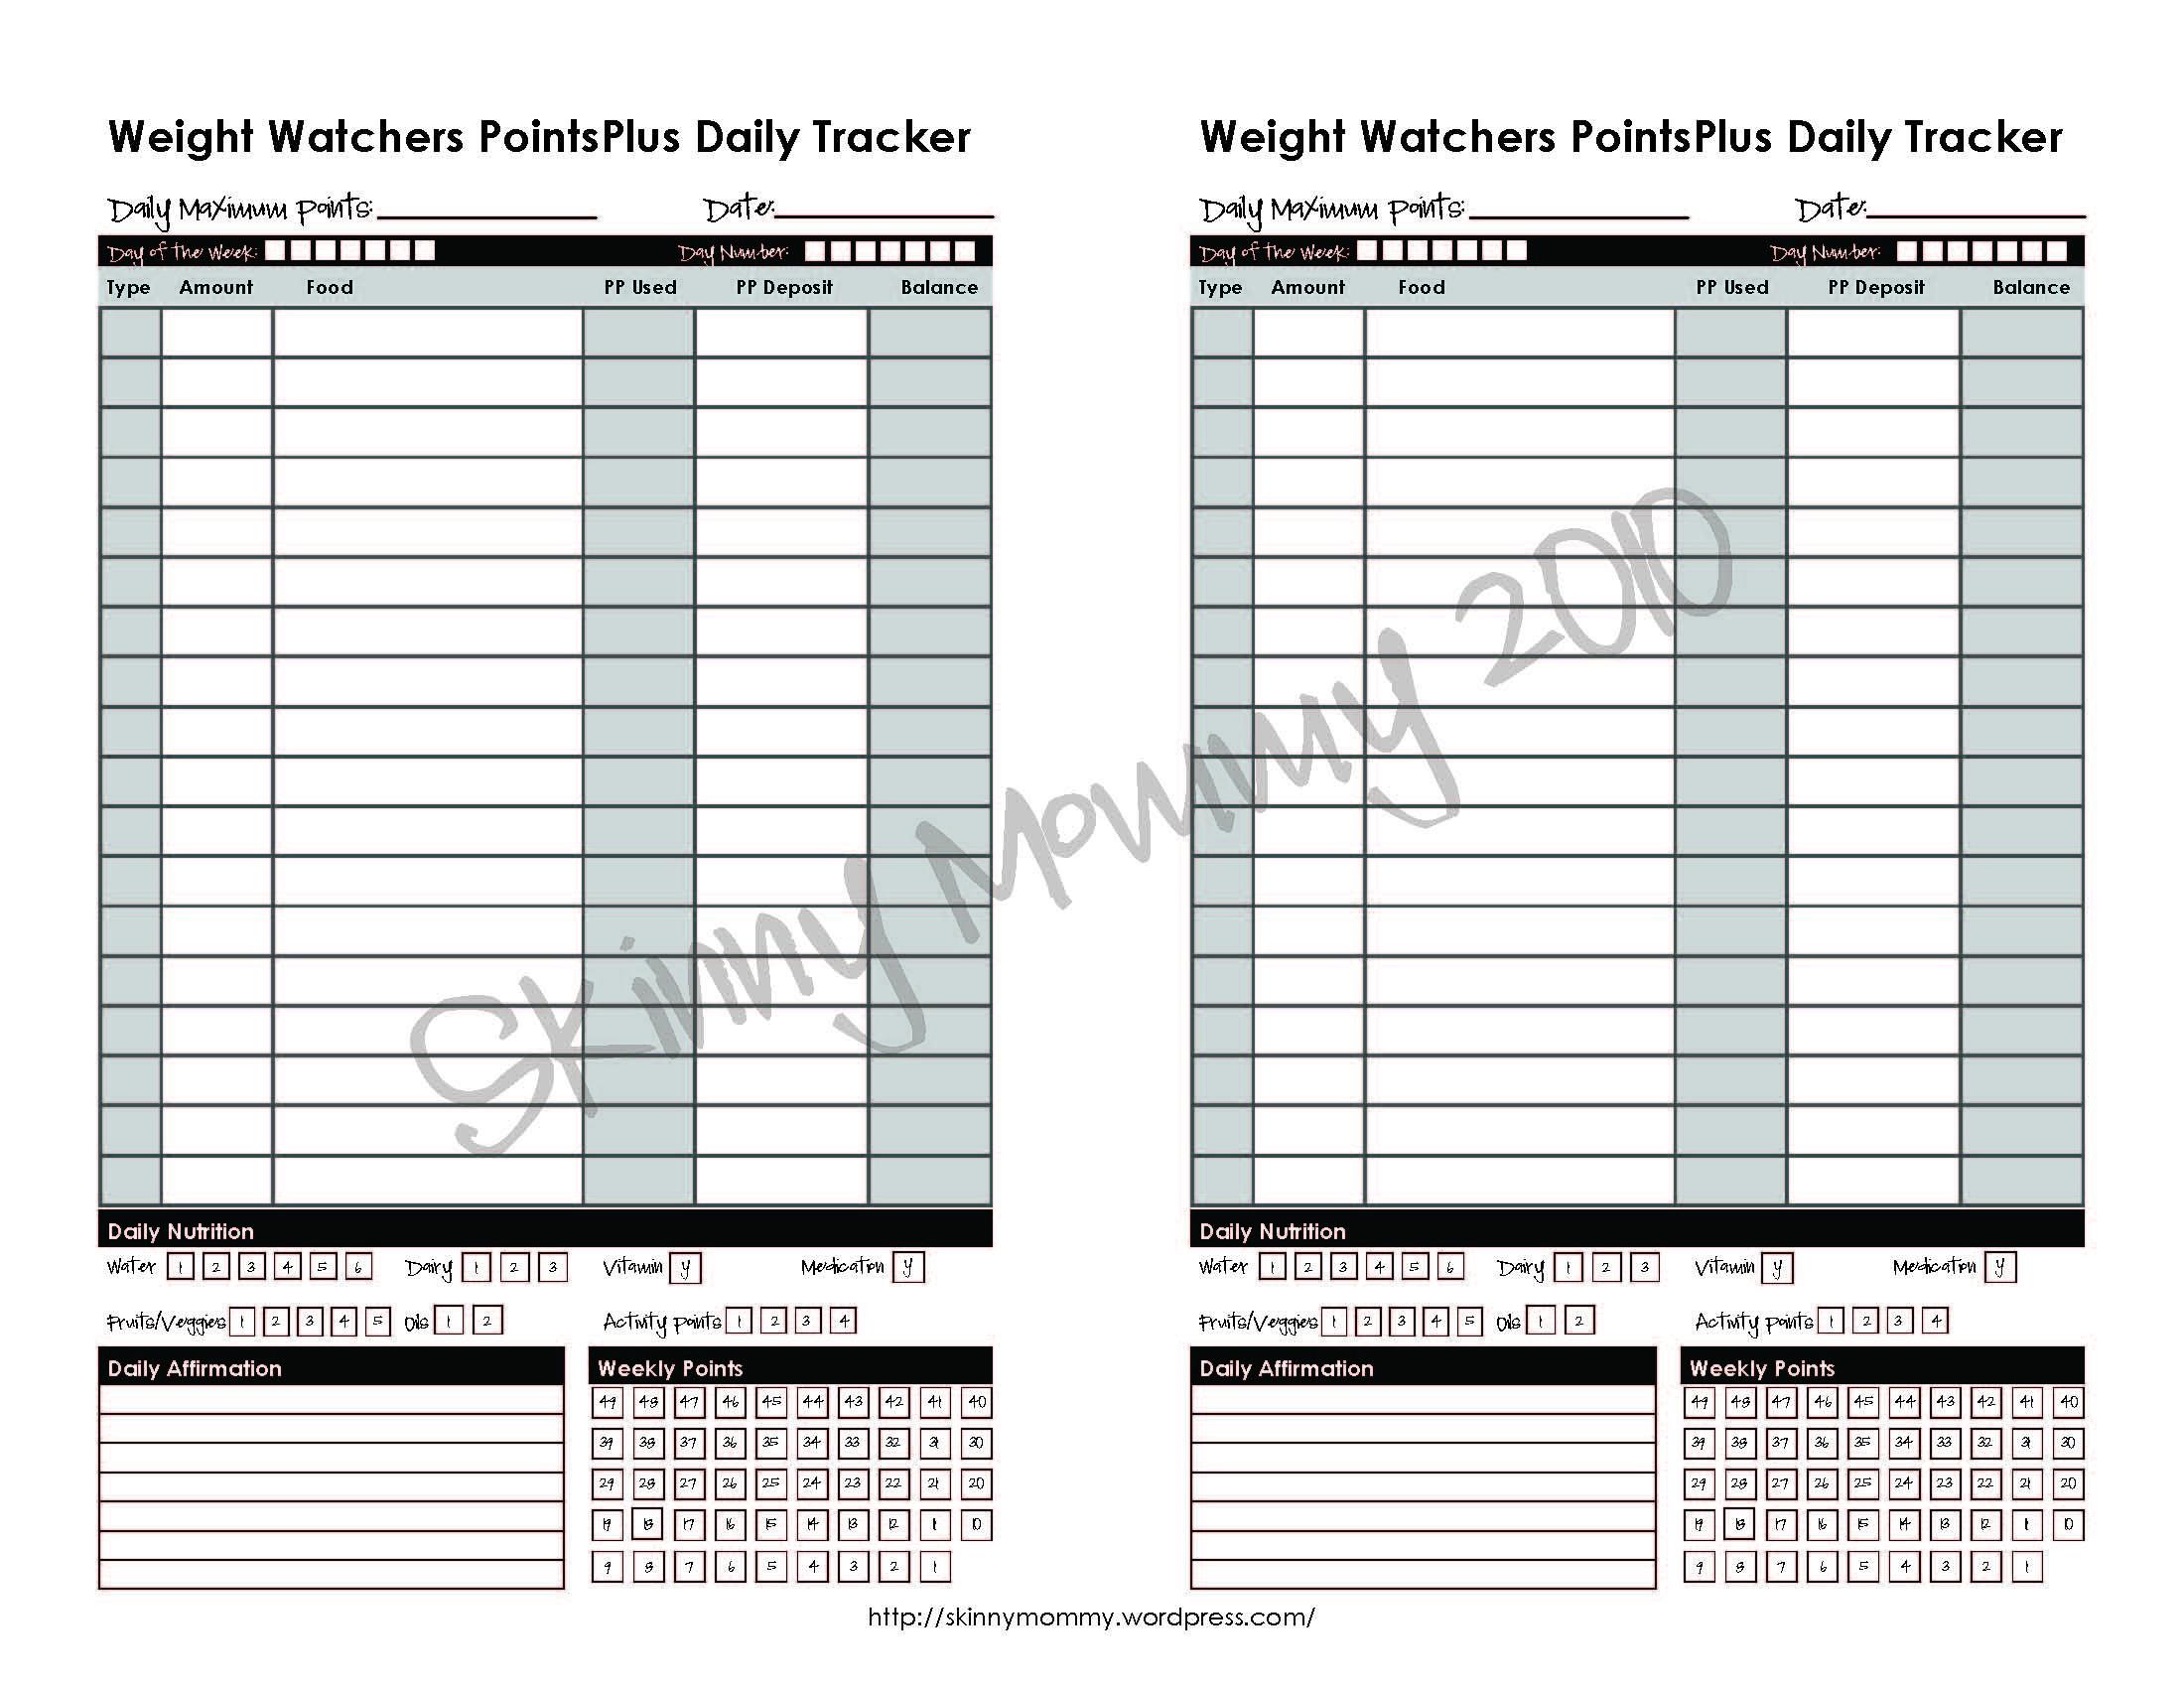 Extrêmement Printable Download: $3.00/ Weight Watchers PointsPlus Tracker  YX32